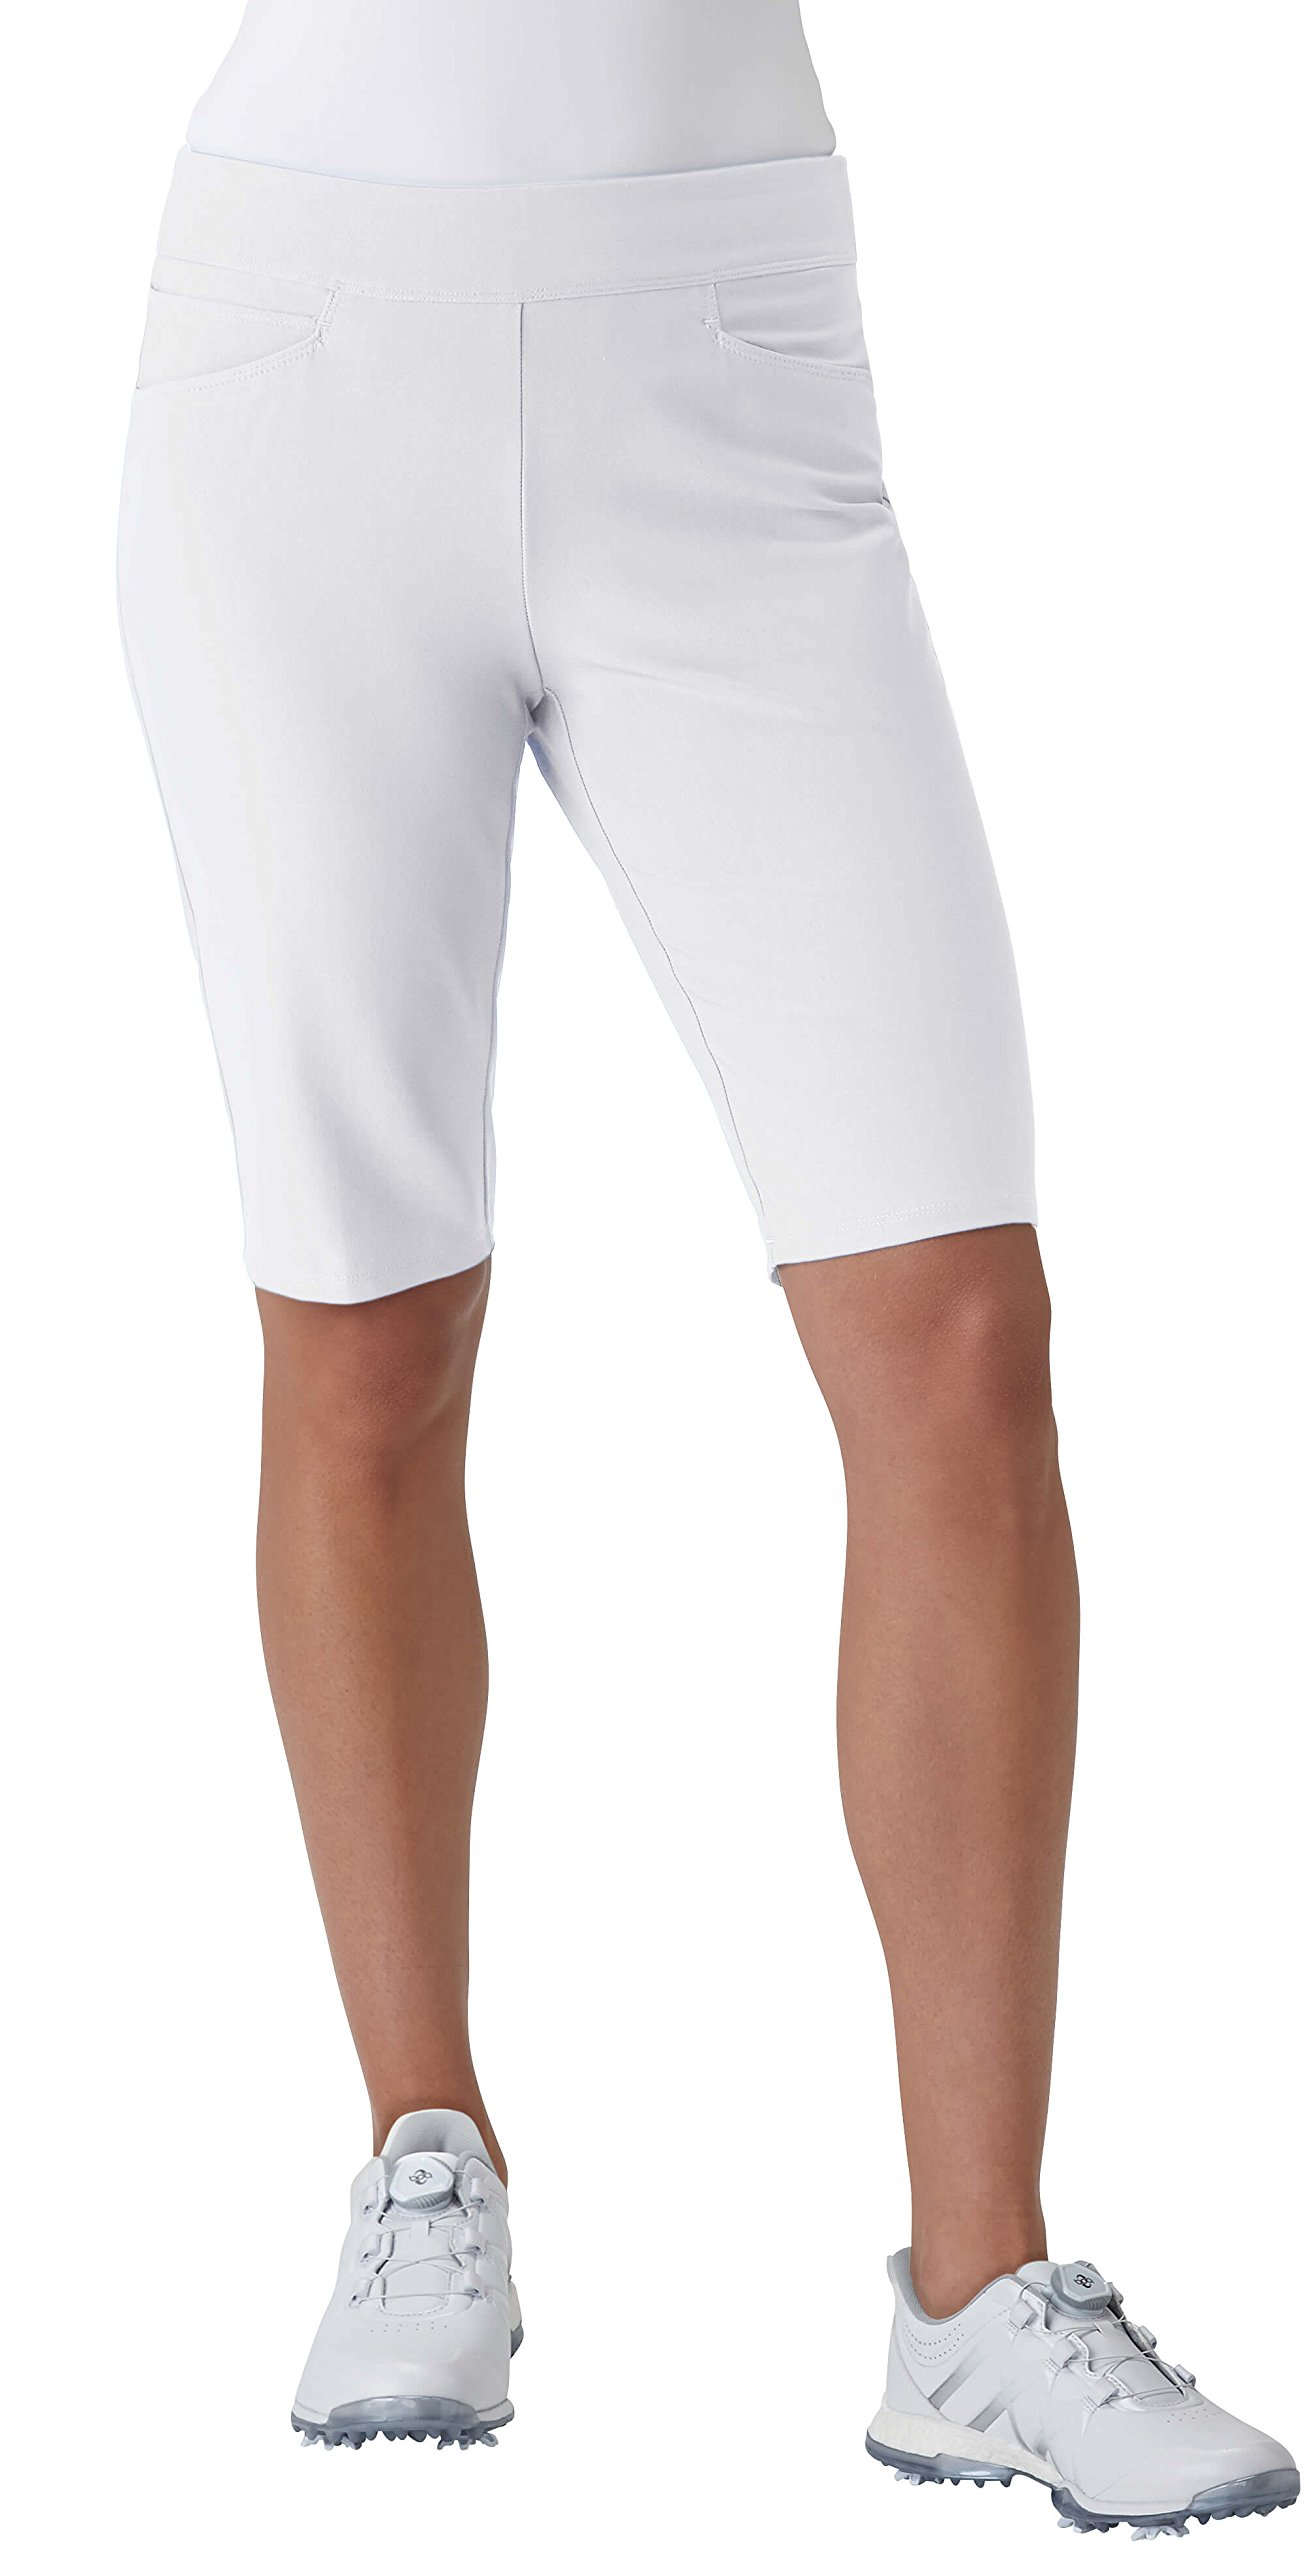 adidas Golf Women's Adistar Bermuda Shorts, White, X-Large